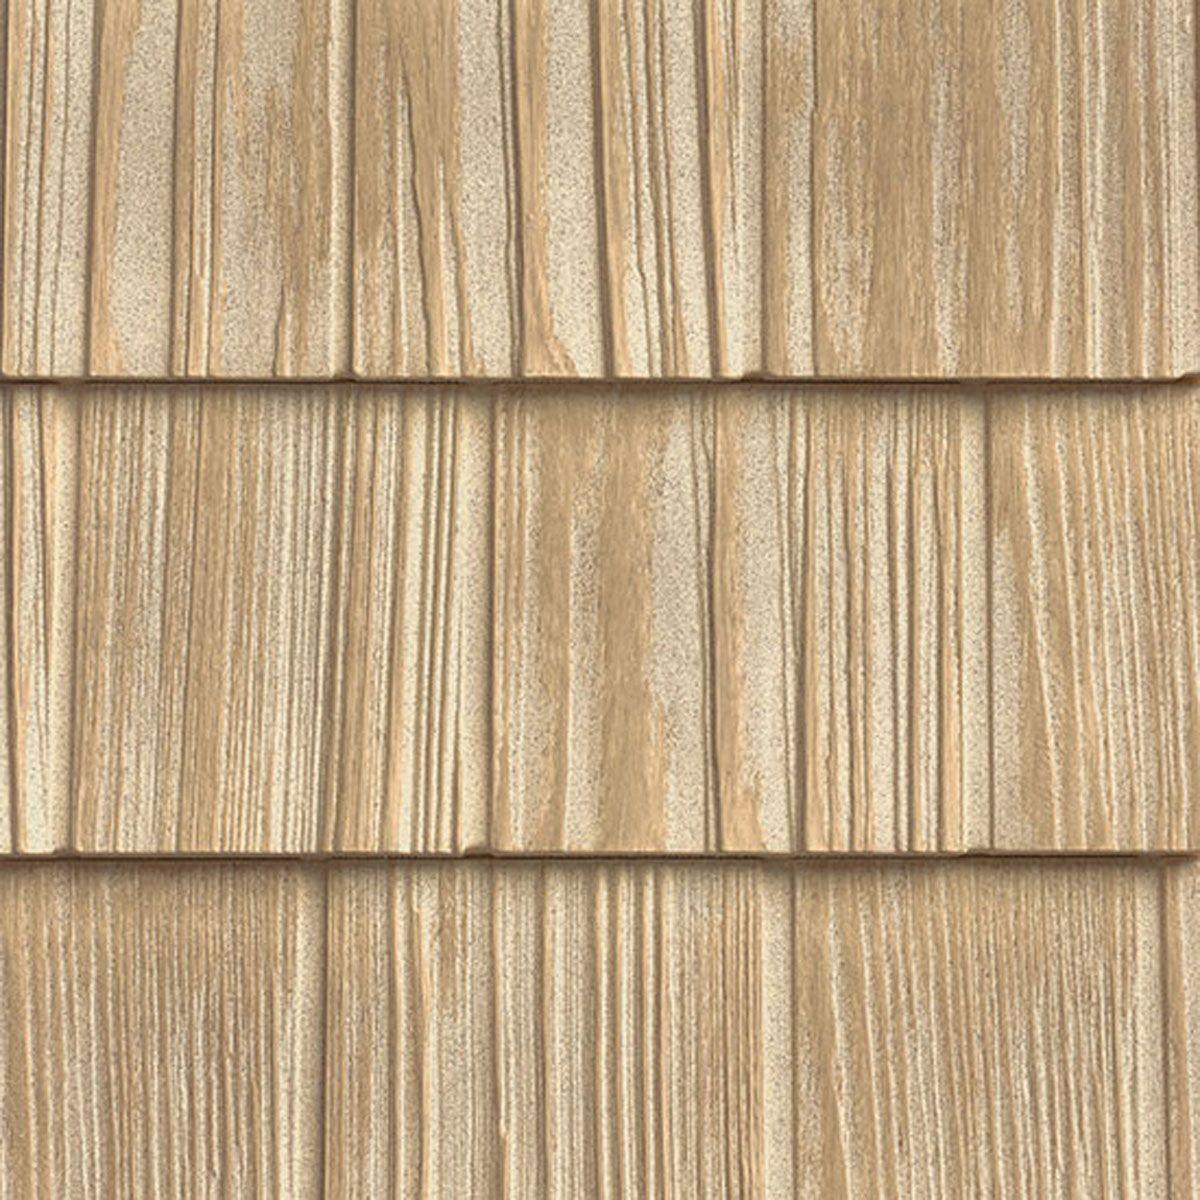 10 Inch W X 62 1 2 Inch L Exposure Vinyl Staggered Shakes 23 Panels Ctn 100 Sq Feet 202 Oceanside Cedar Shake Siding Shake Siding Cedar Shakes